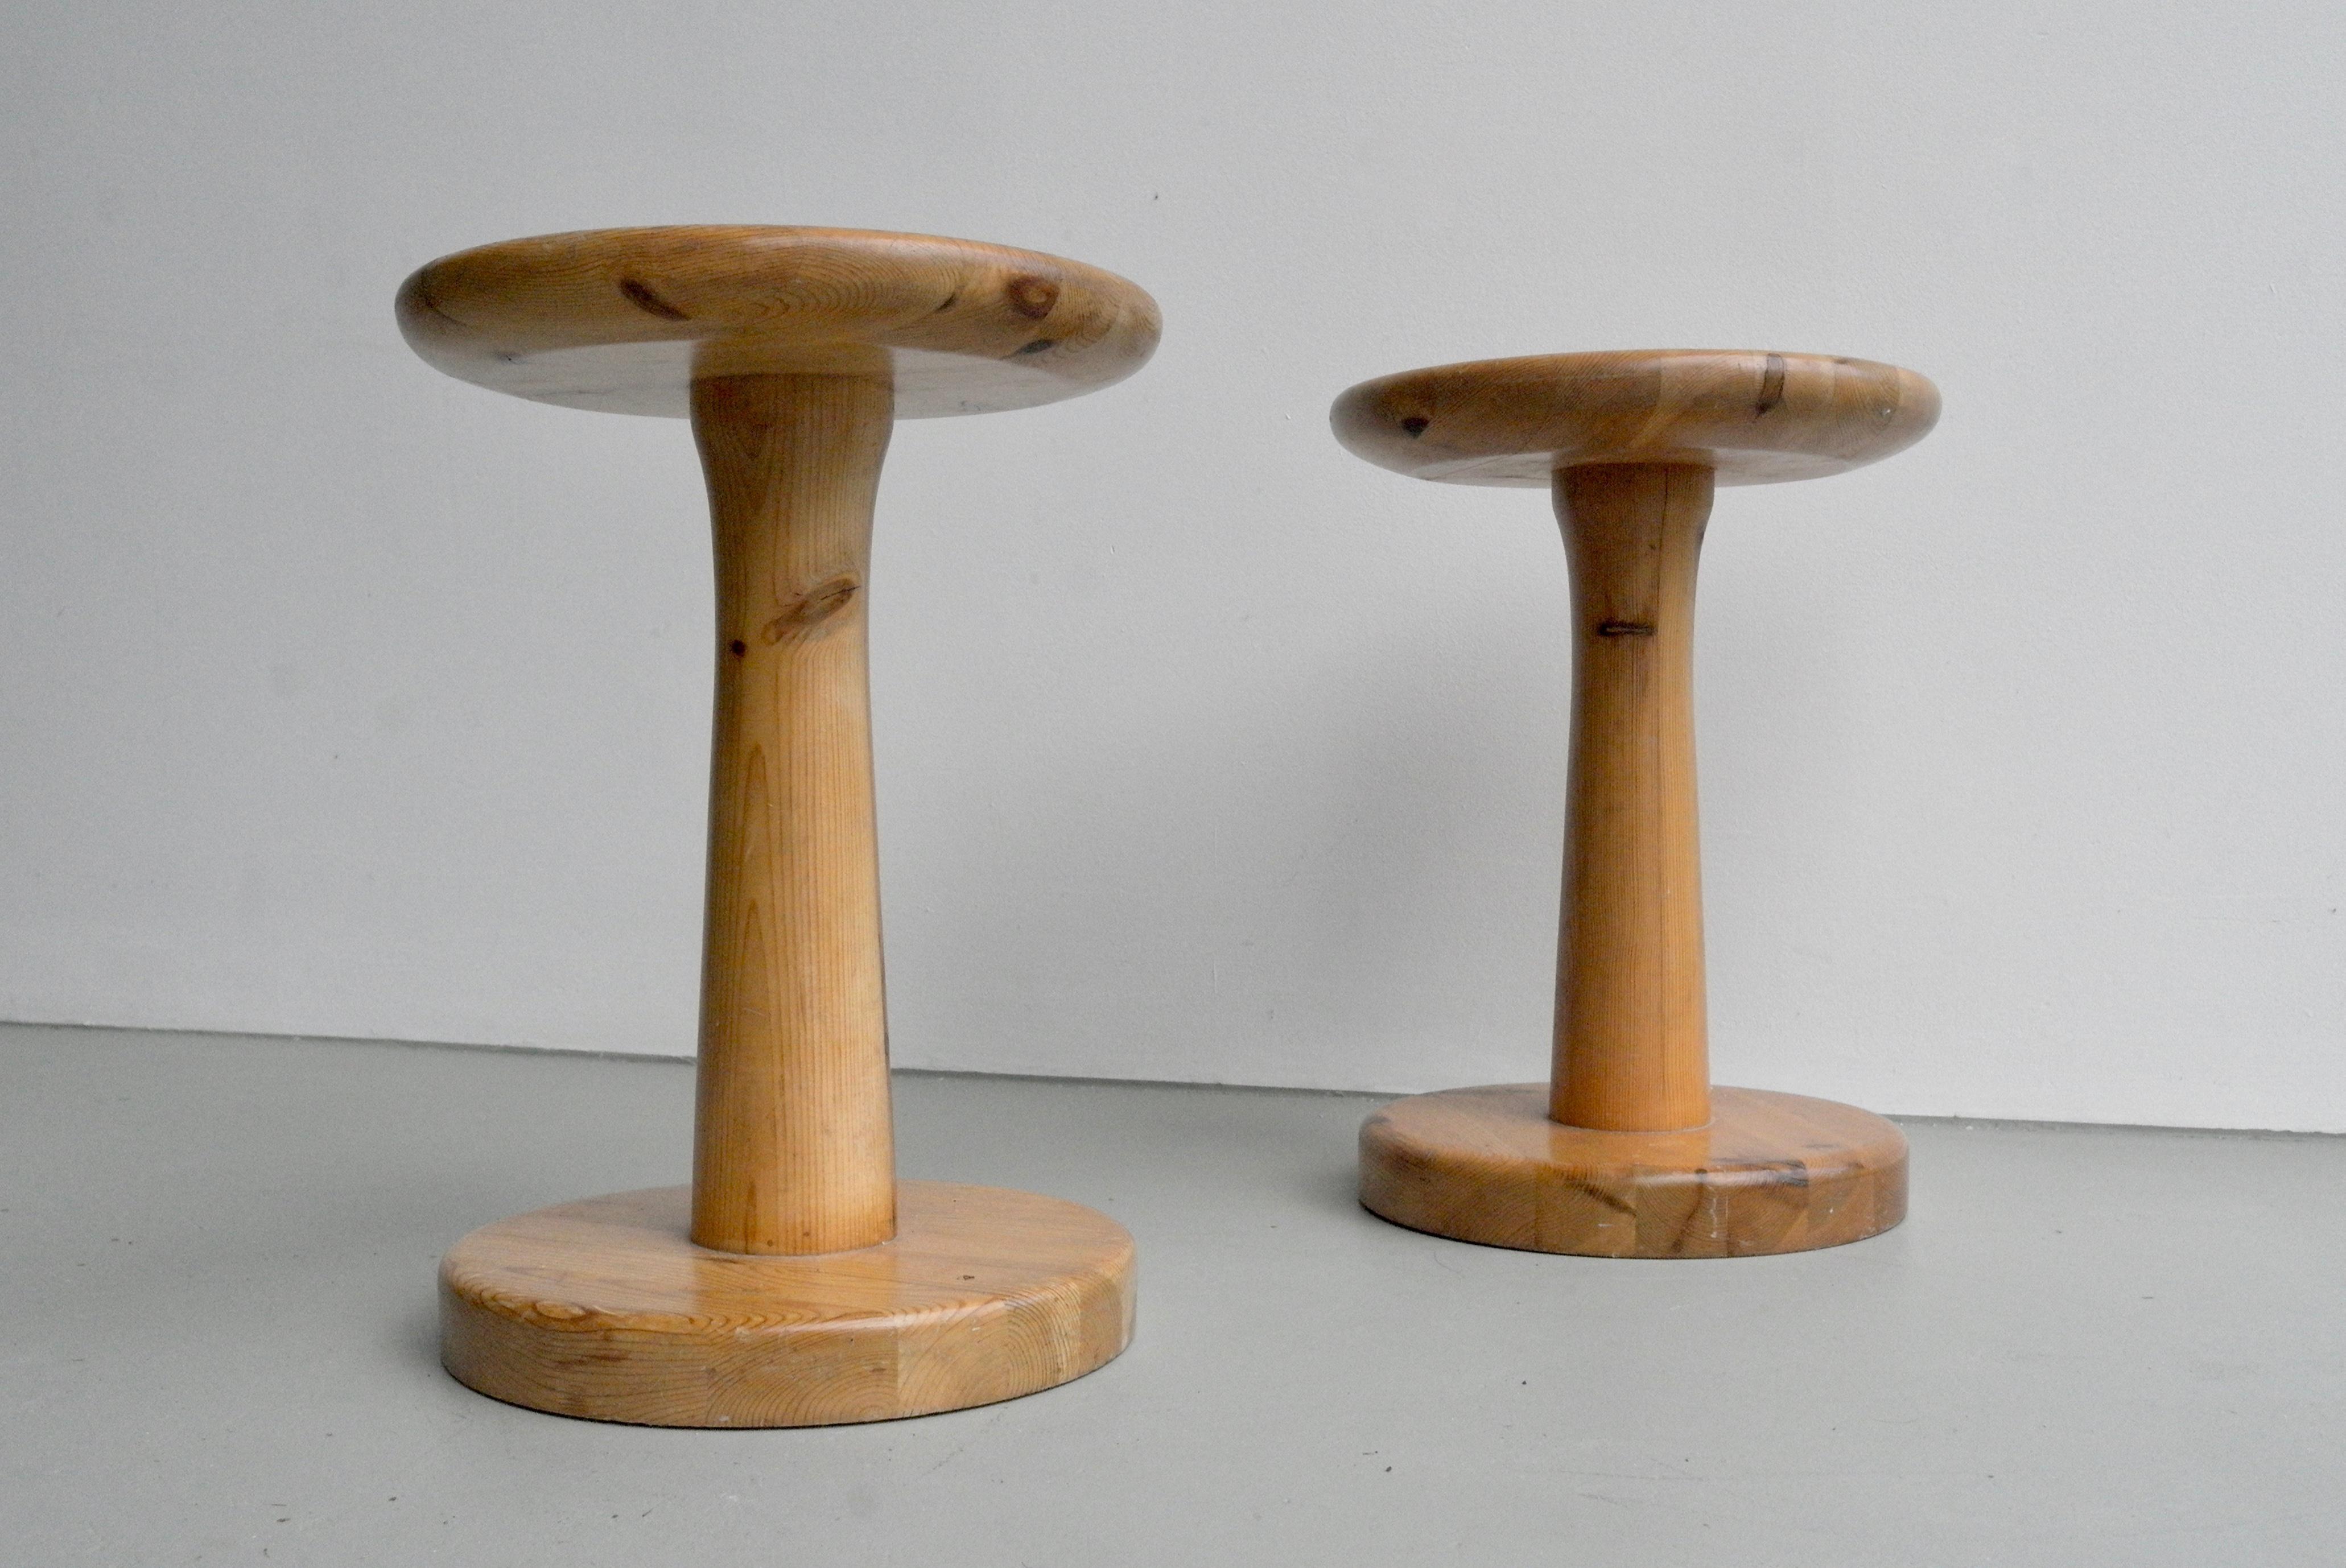 Awe Inspiring Pair Of Curved Solid Pine Wood Stools France 1960S At 1Stdibs Inzonedesignstudio Interior Chair Design Inzonedesignstudiocom